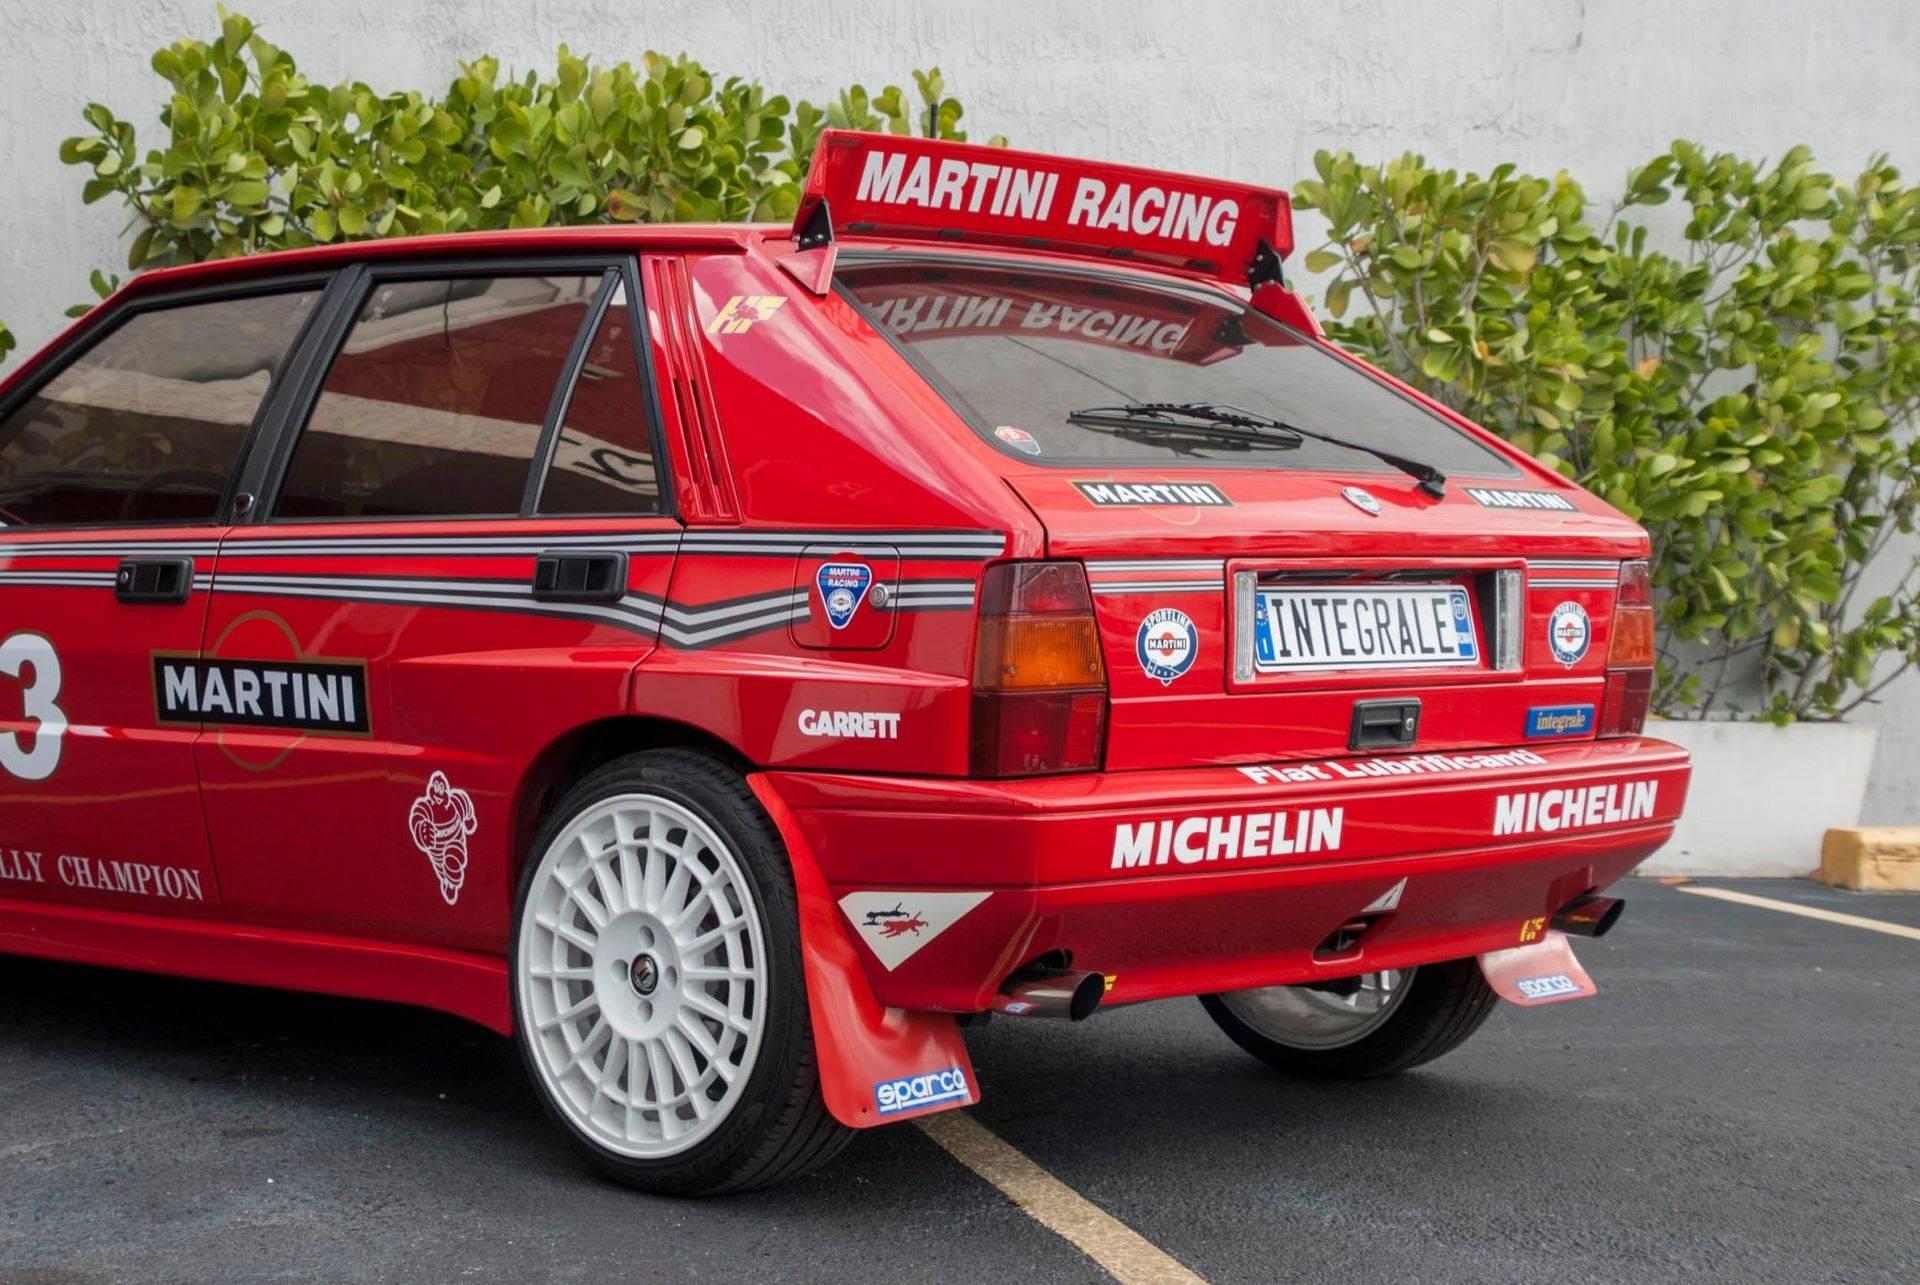 Lancia-Delta-Integrale-8V-1989-8